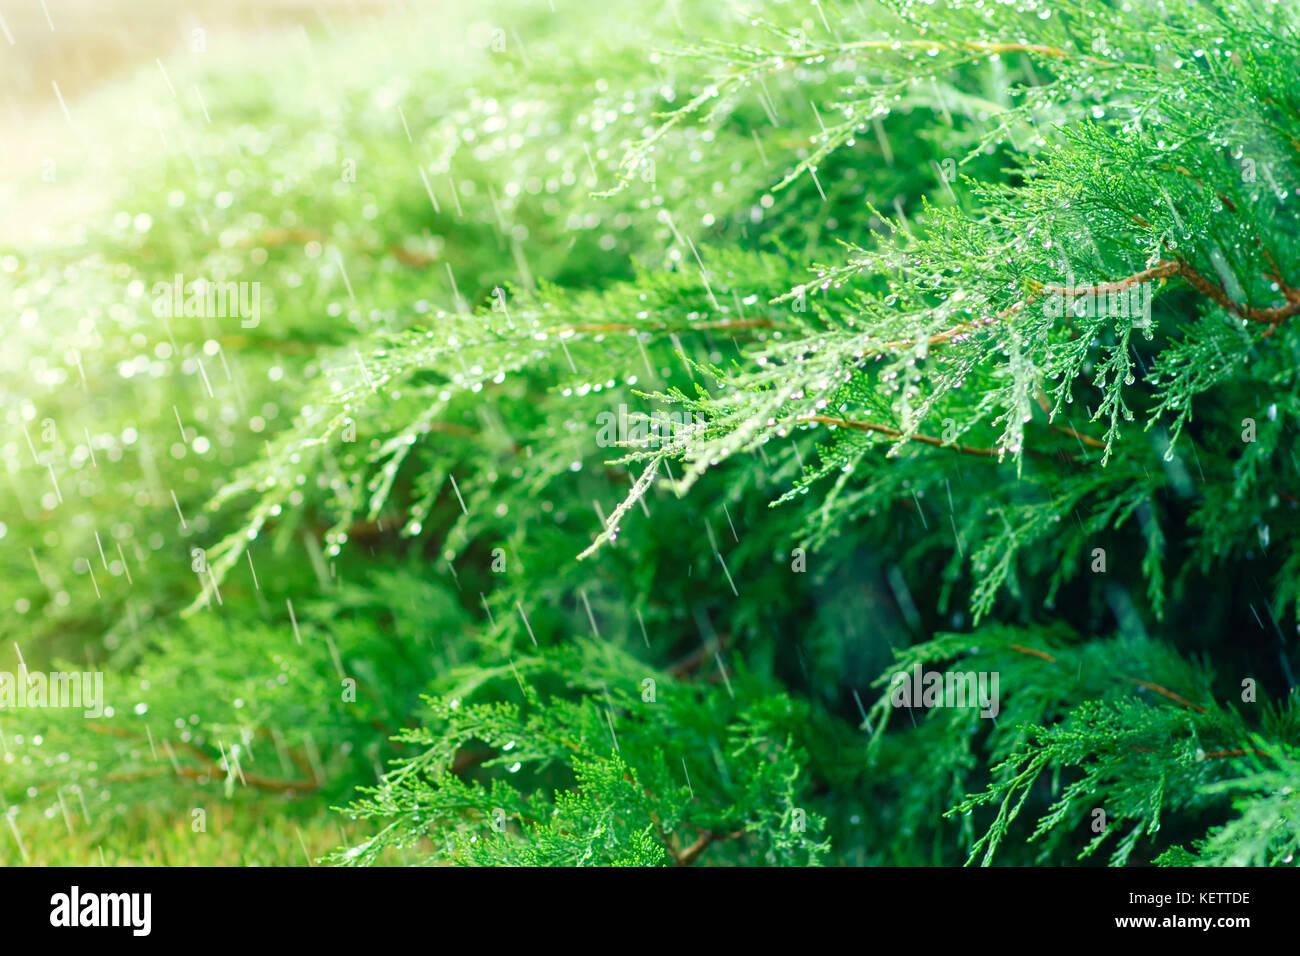 Watering juniper on a lawn, splashing water - Stock Image